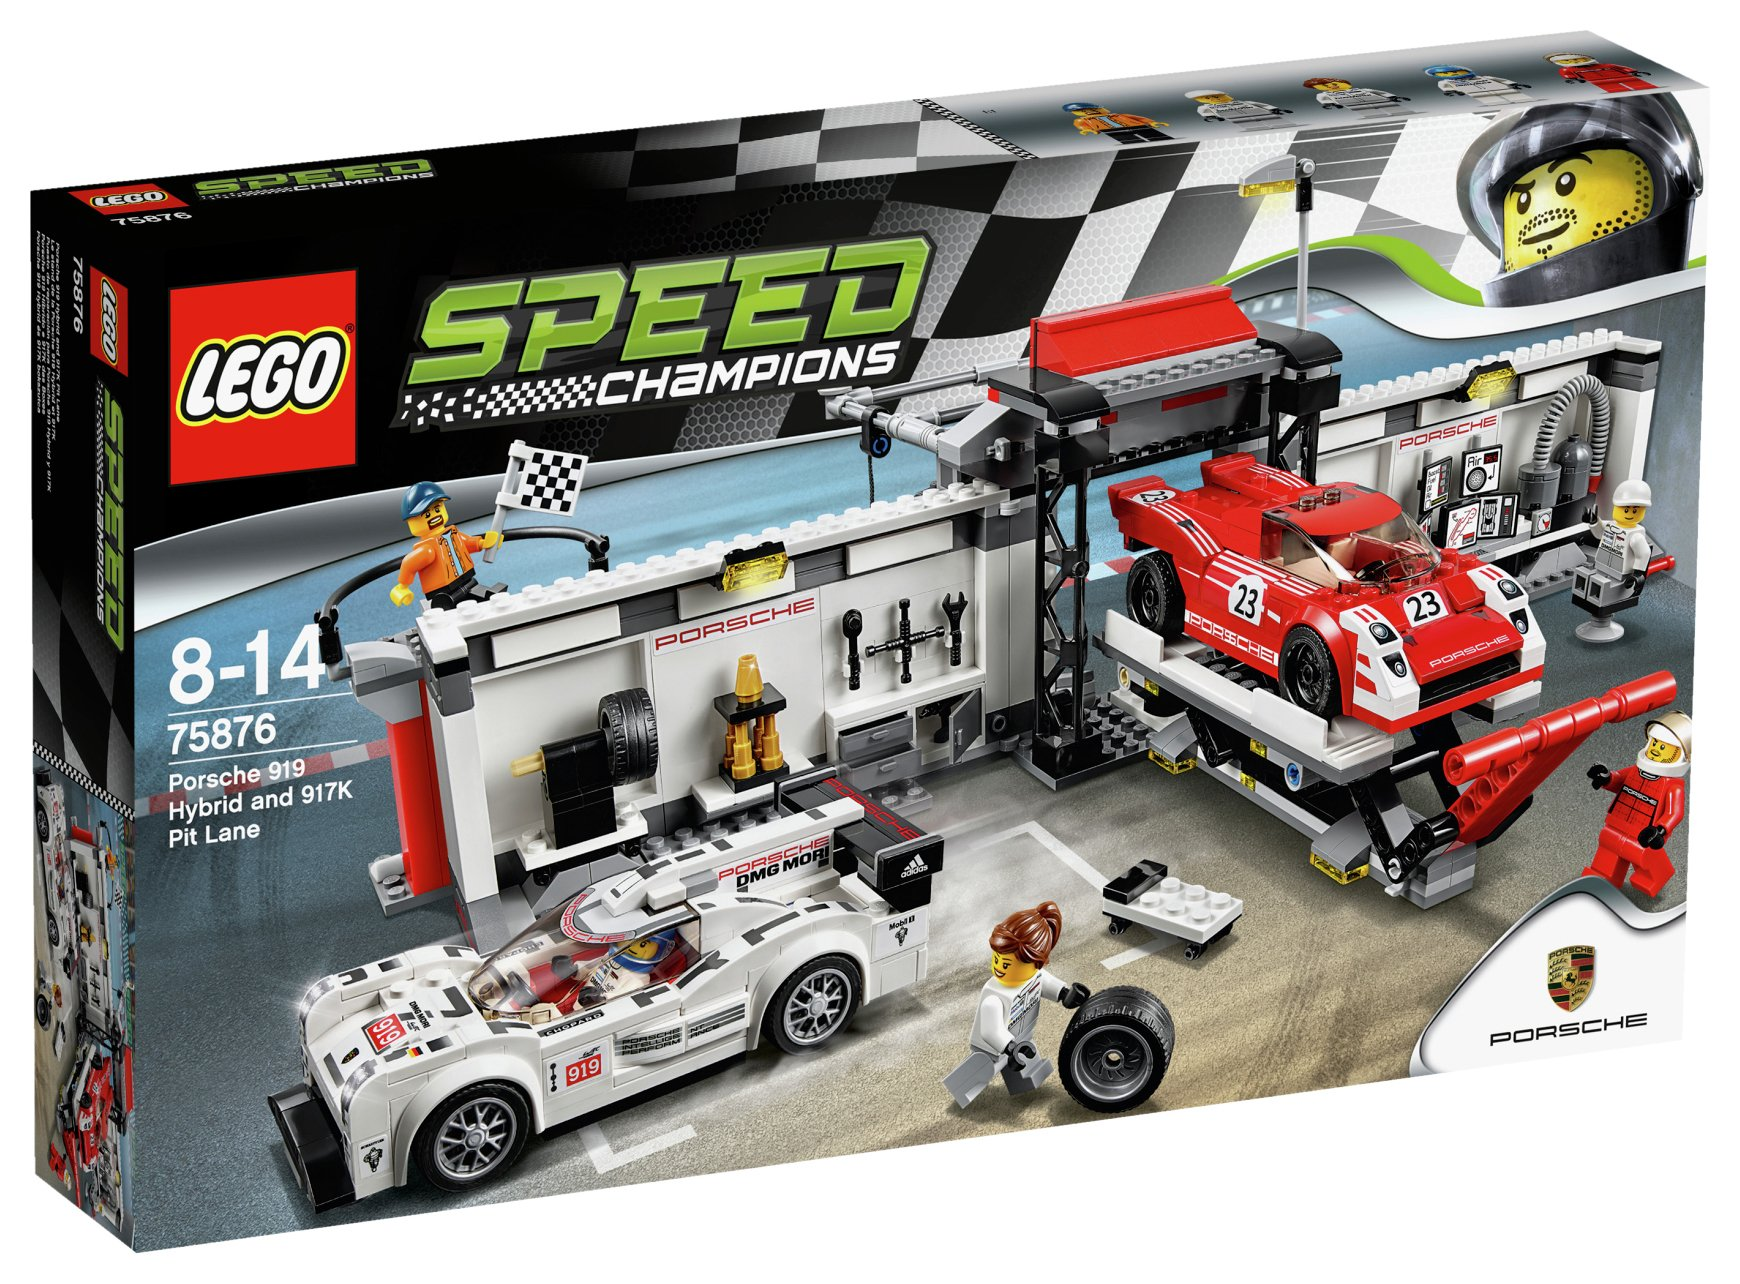 Image of LEGO Speed Champions Porsche 919 Hybrid 917K Pit Lane -75876